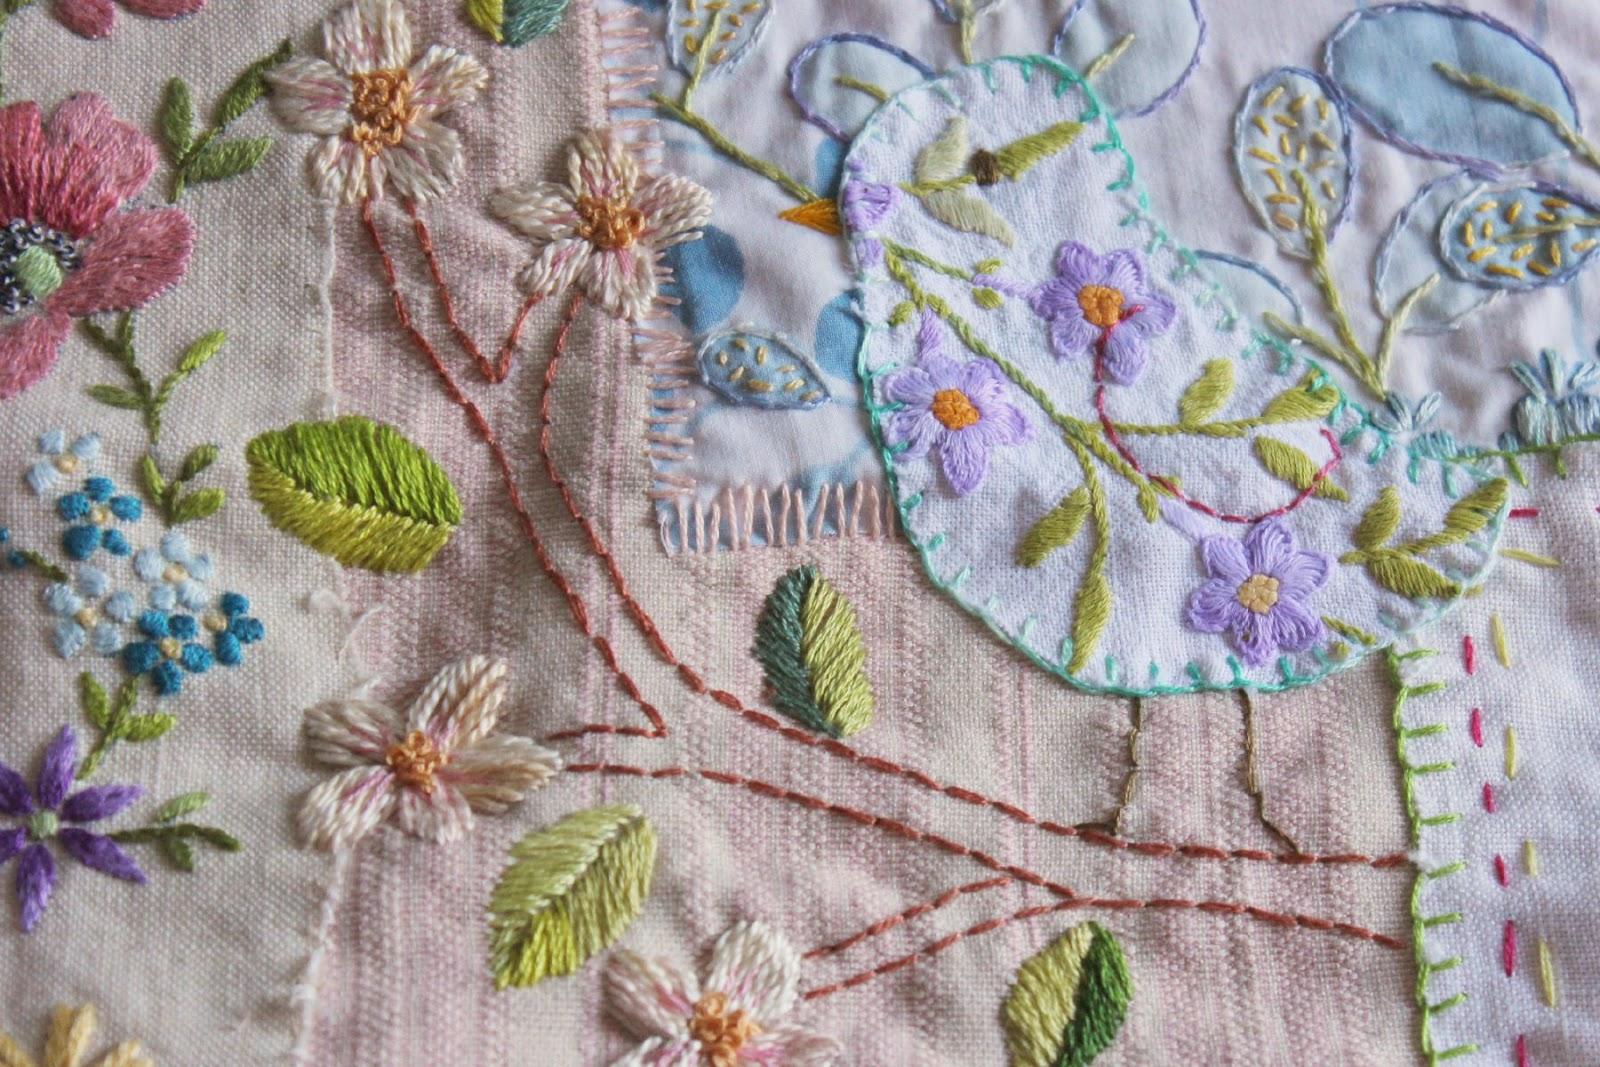 Embroidery work near me makaroka